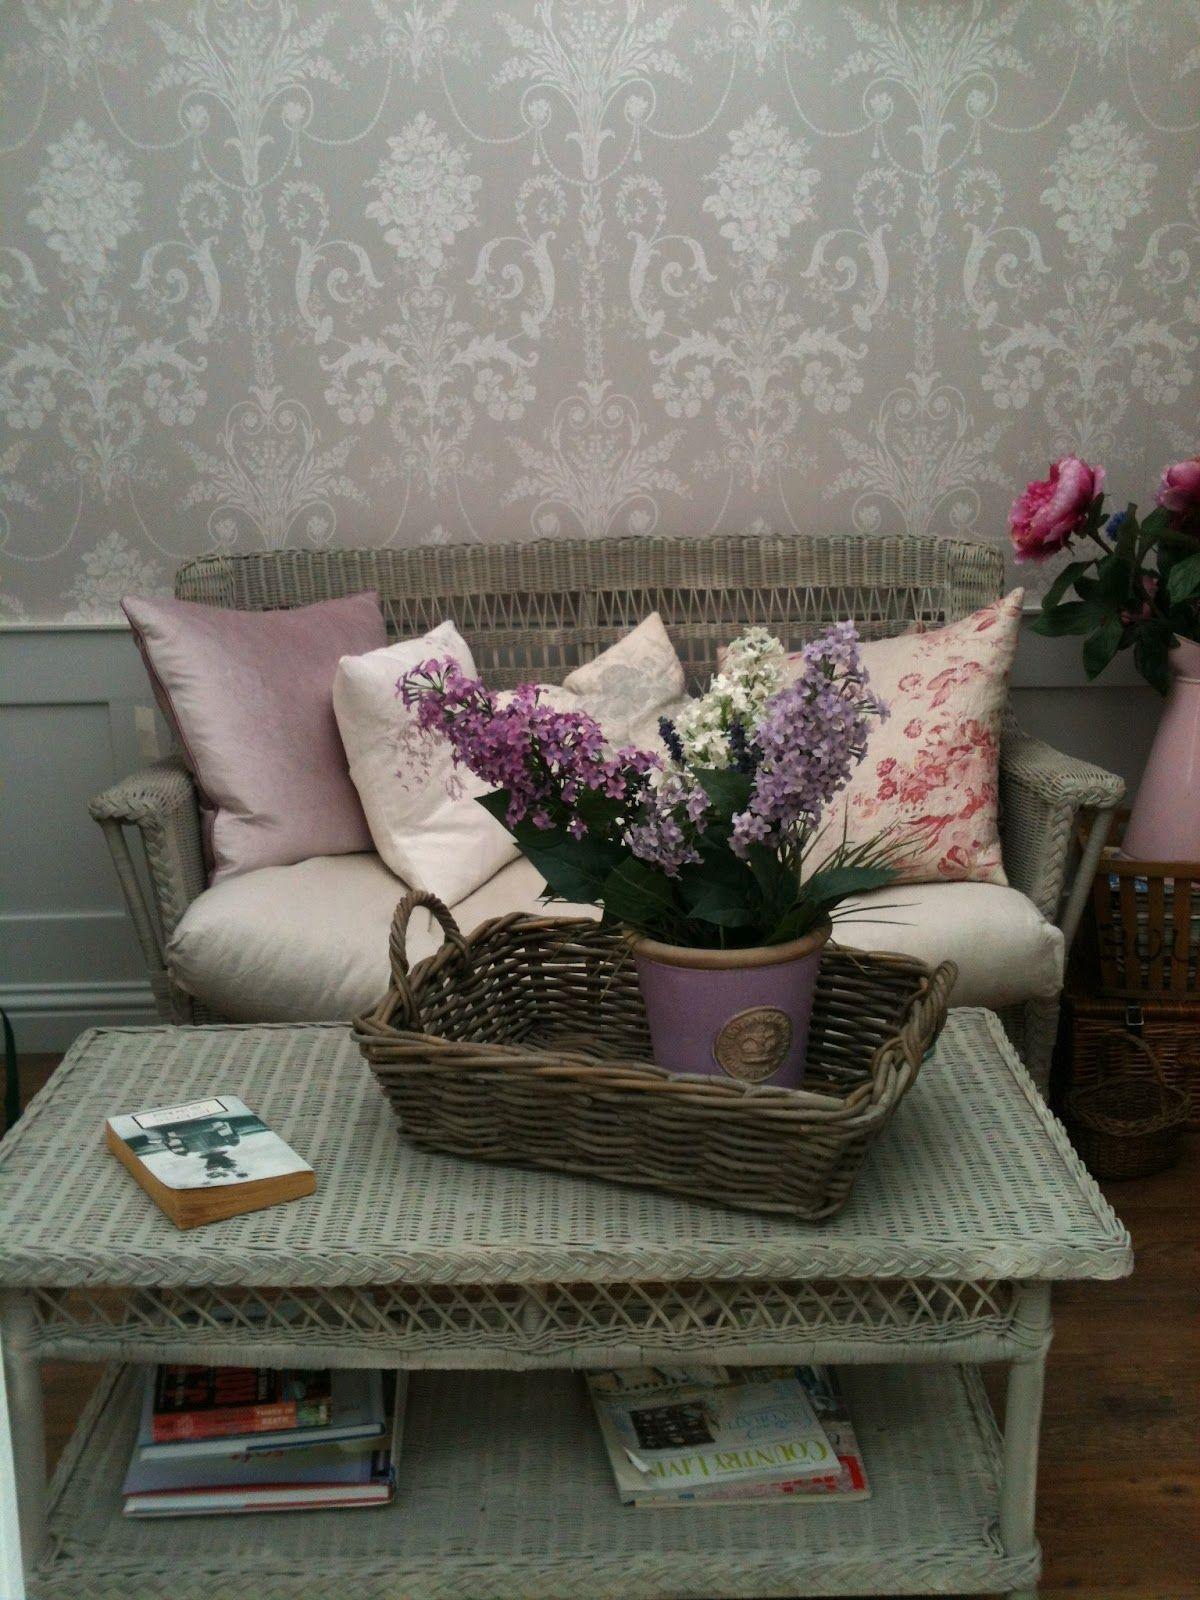 Laura Ashley Josette Dove Grey Wallpaper My Love Of Wicker In